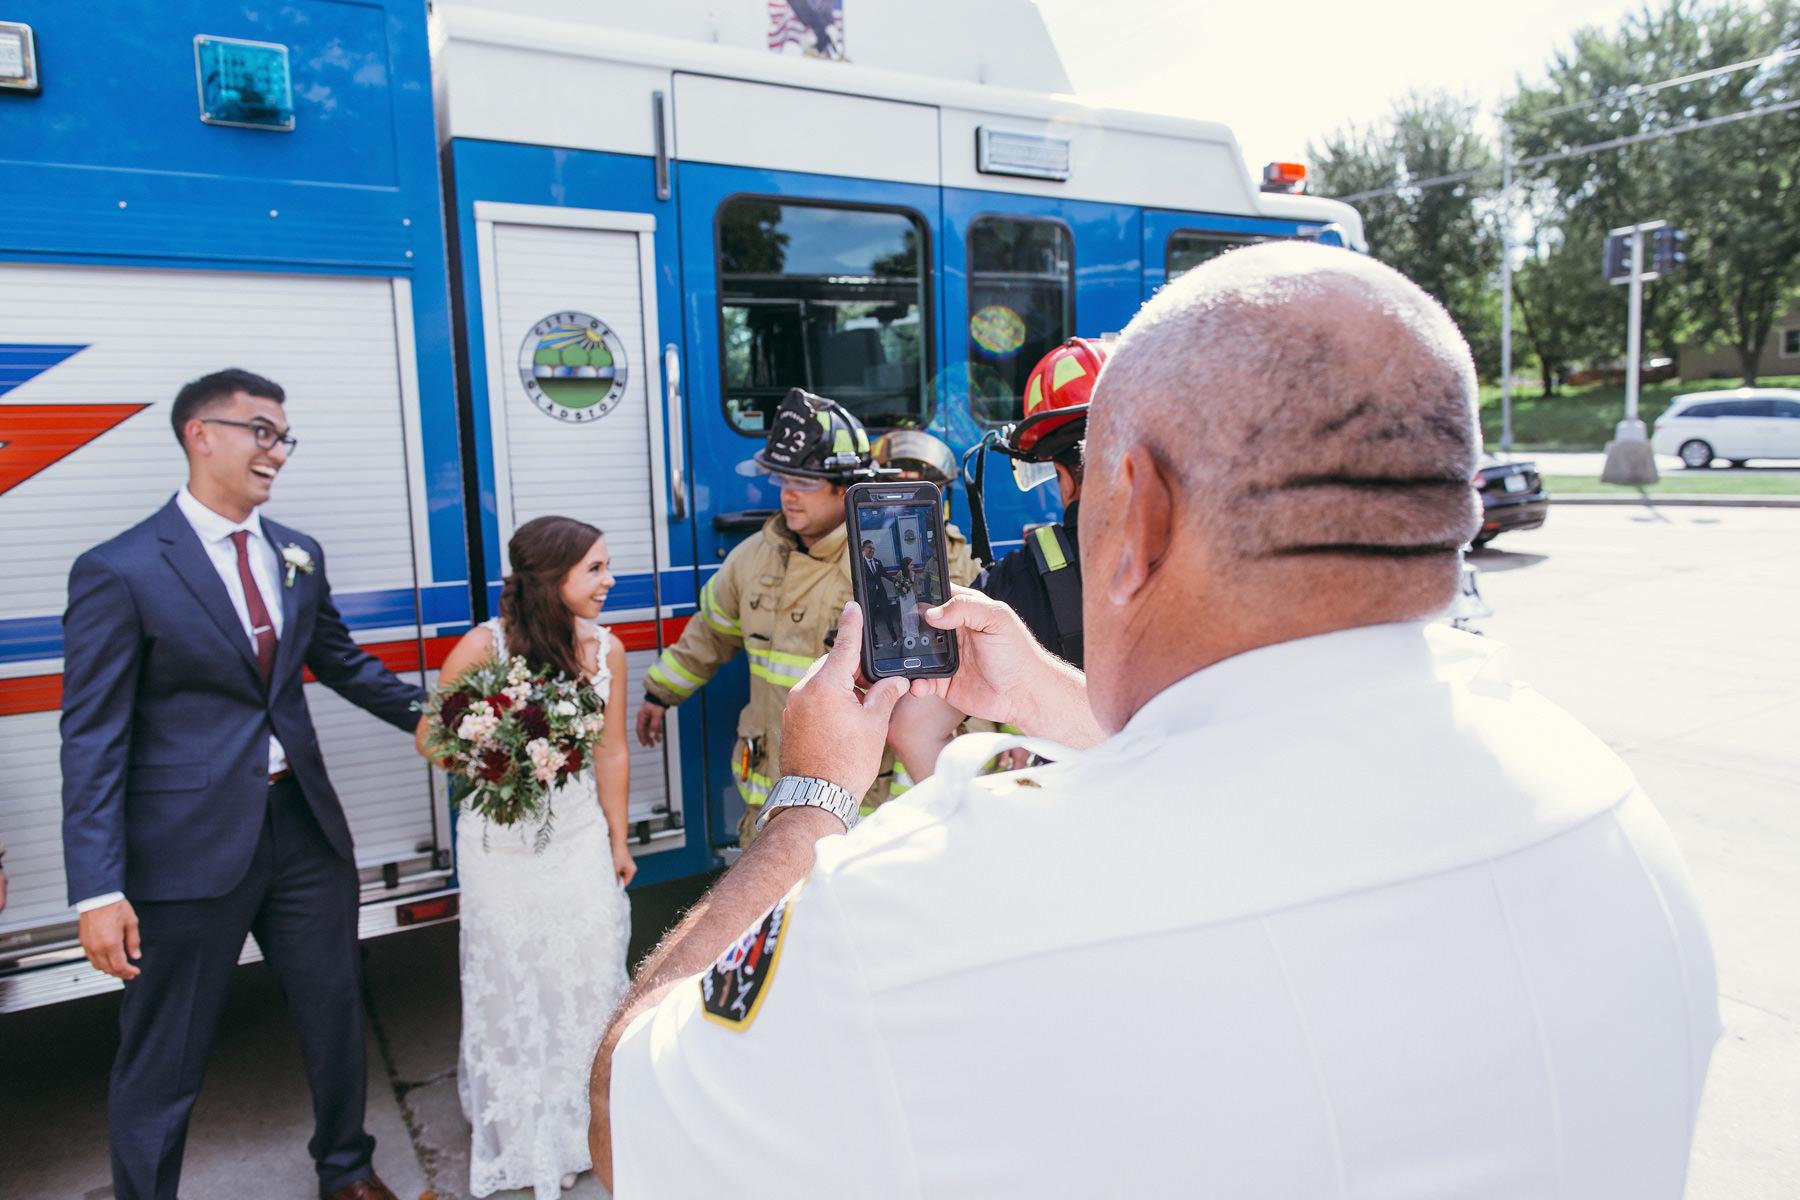 Kansas City Summer Wedding at the Guild_Kindling Wedding Photography Blog39.JPG